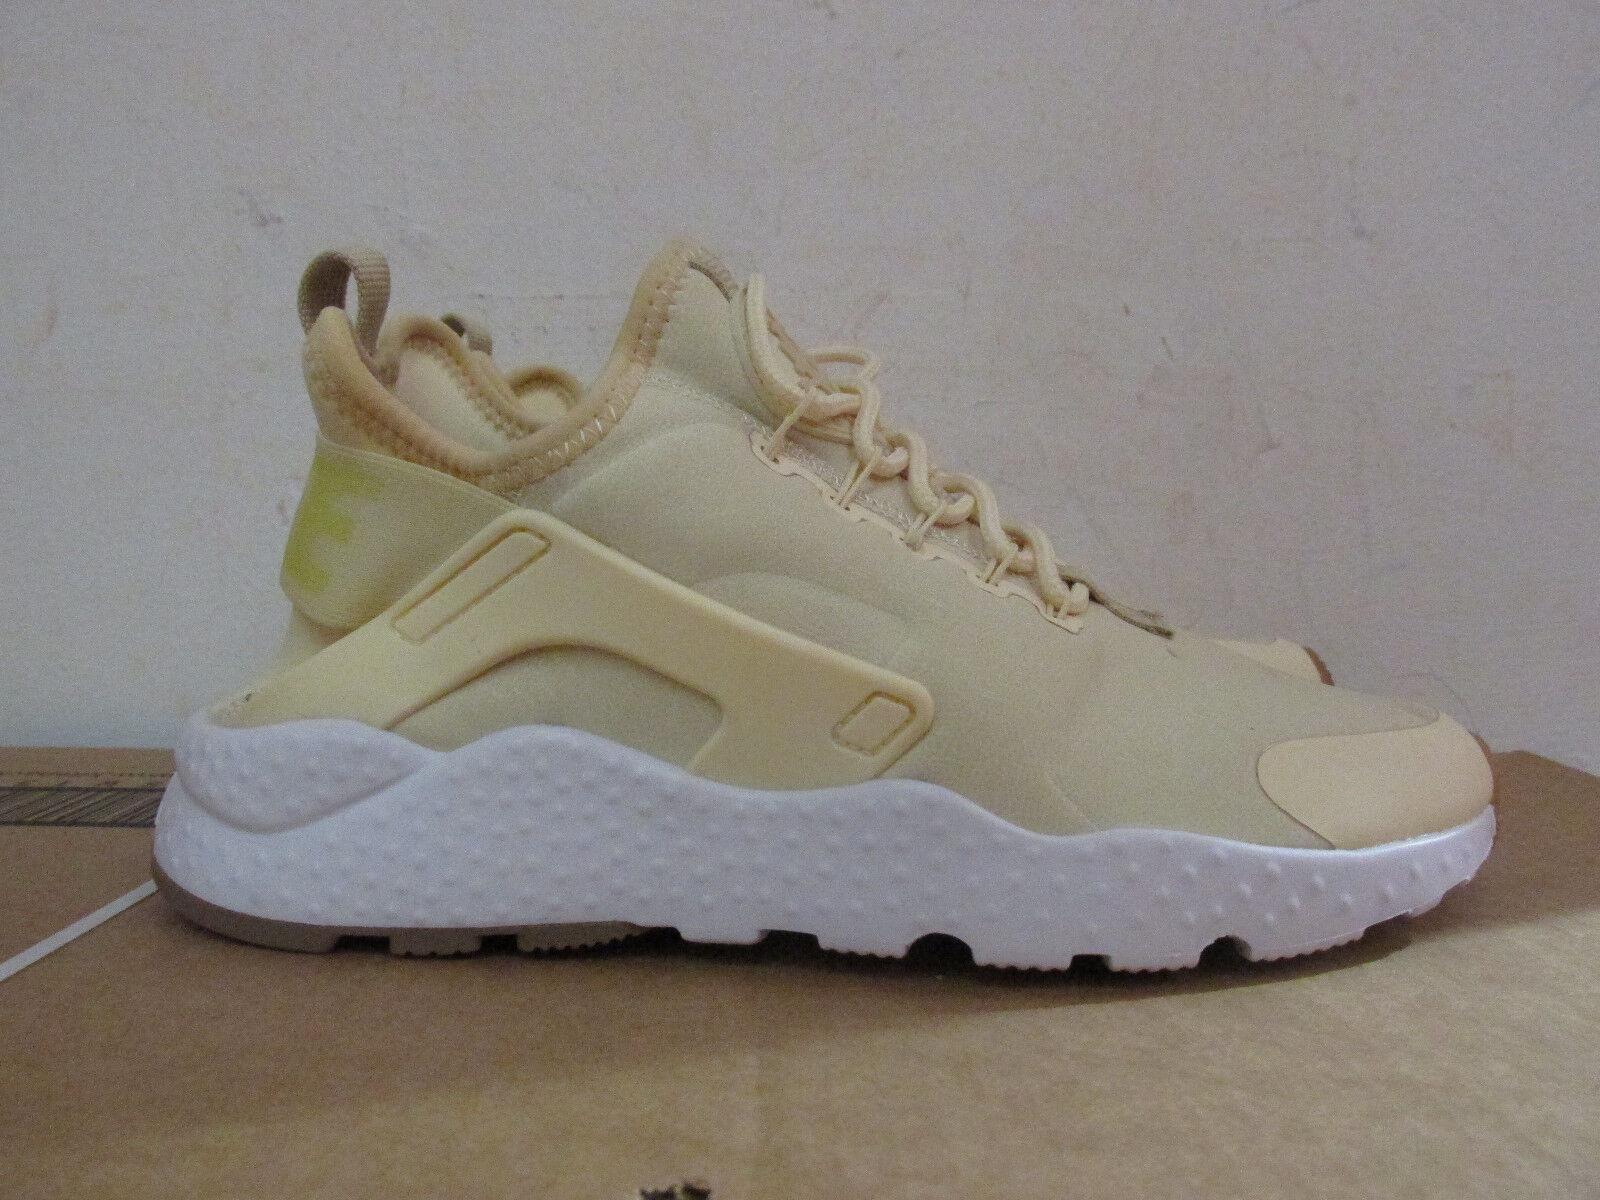 Nike air huarache ultra womens 859511 101 trainers sneakers shoes SAMPLE